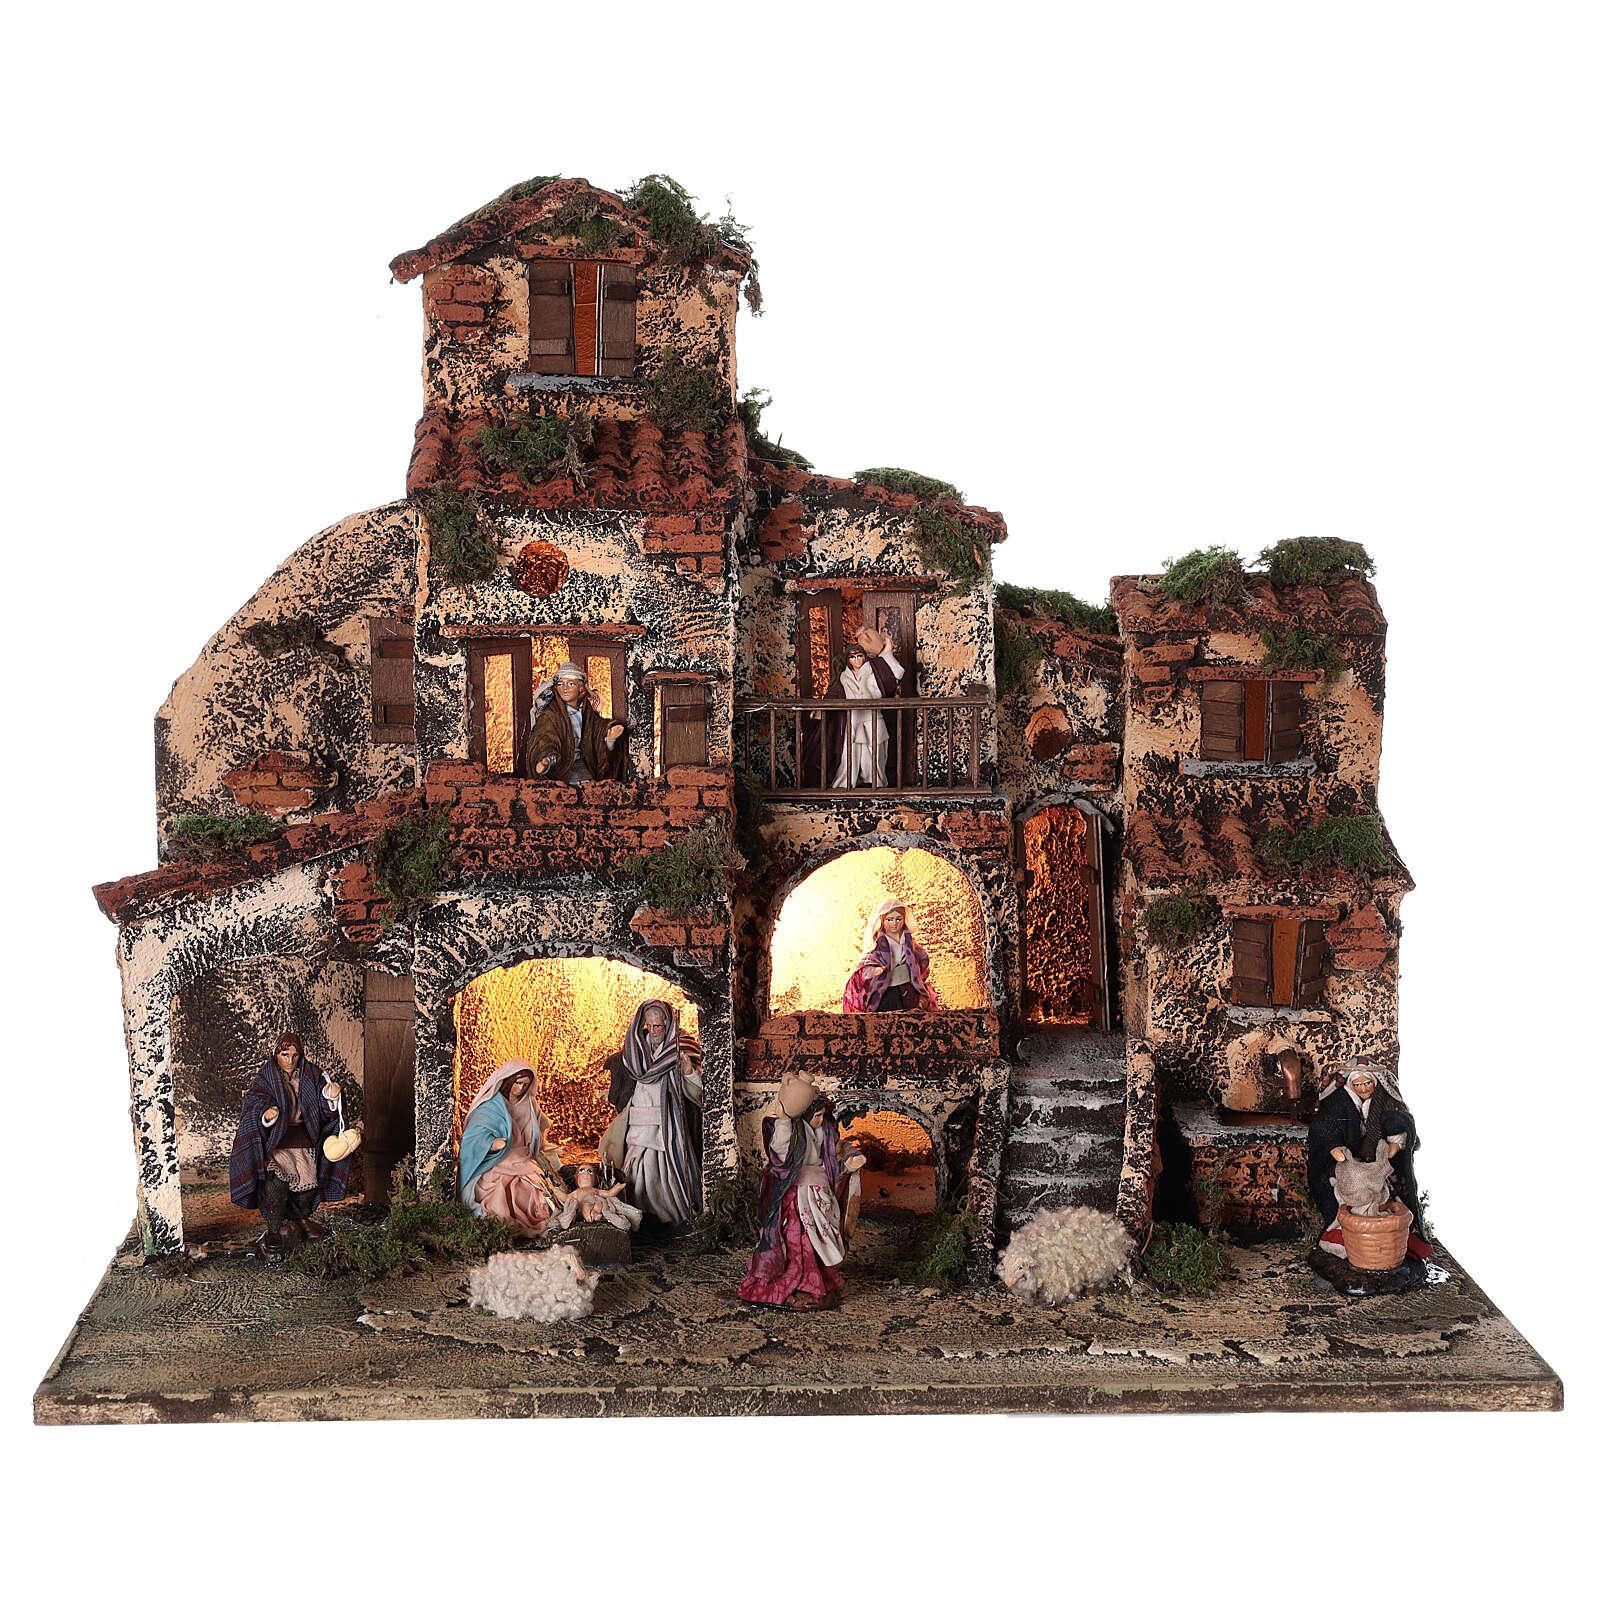 Borgo presepe napoletano completo fontana luci 45x50x35 cm 4